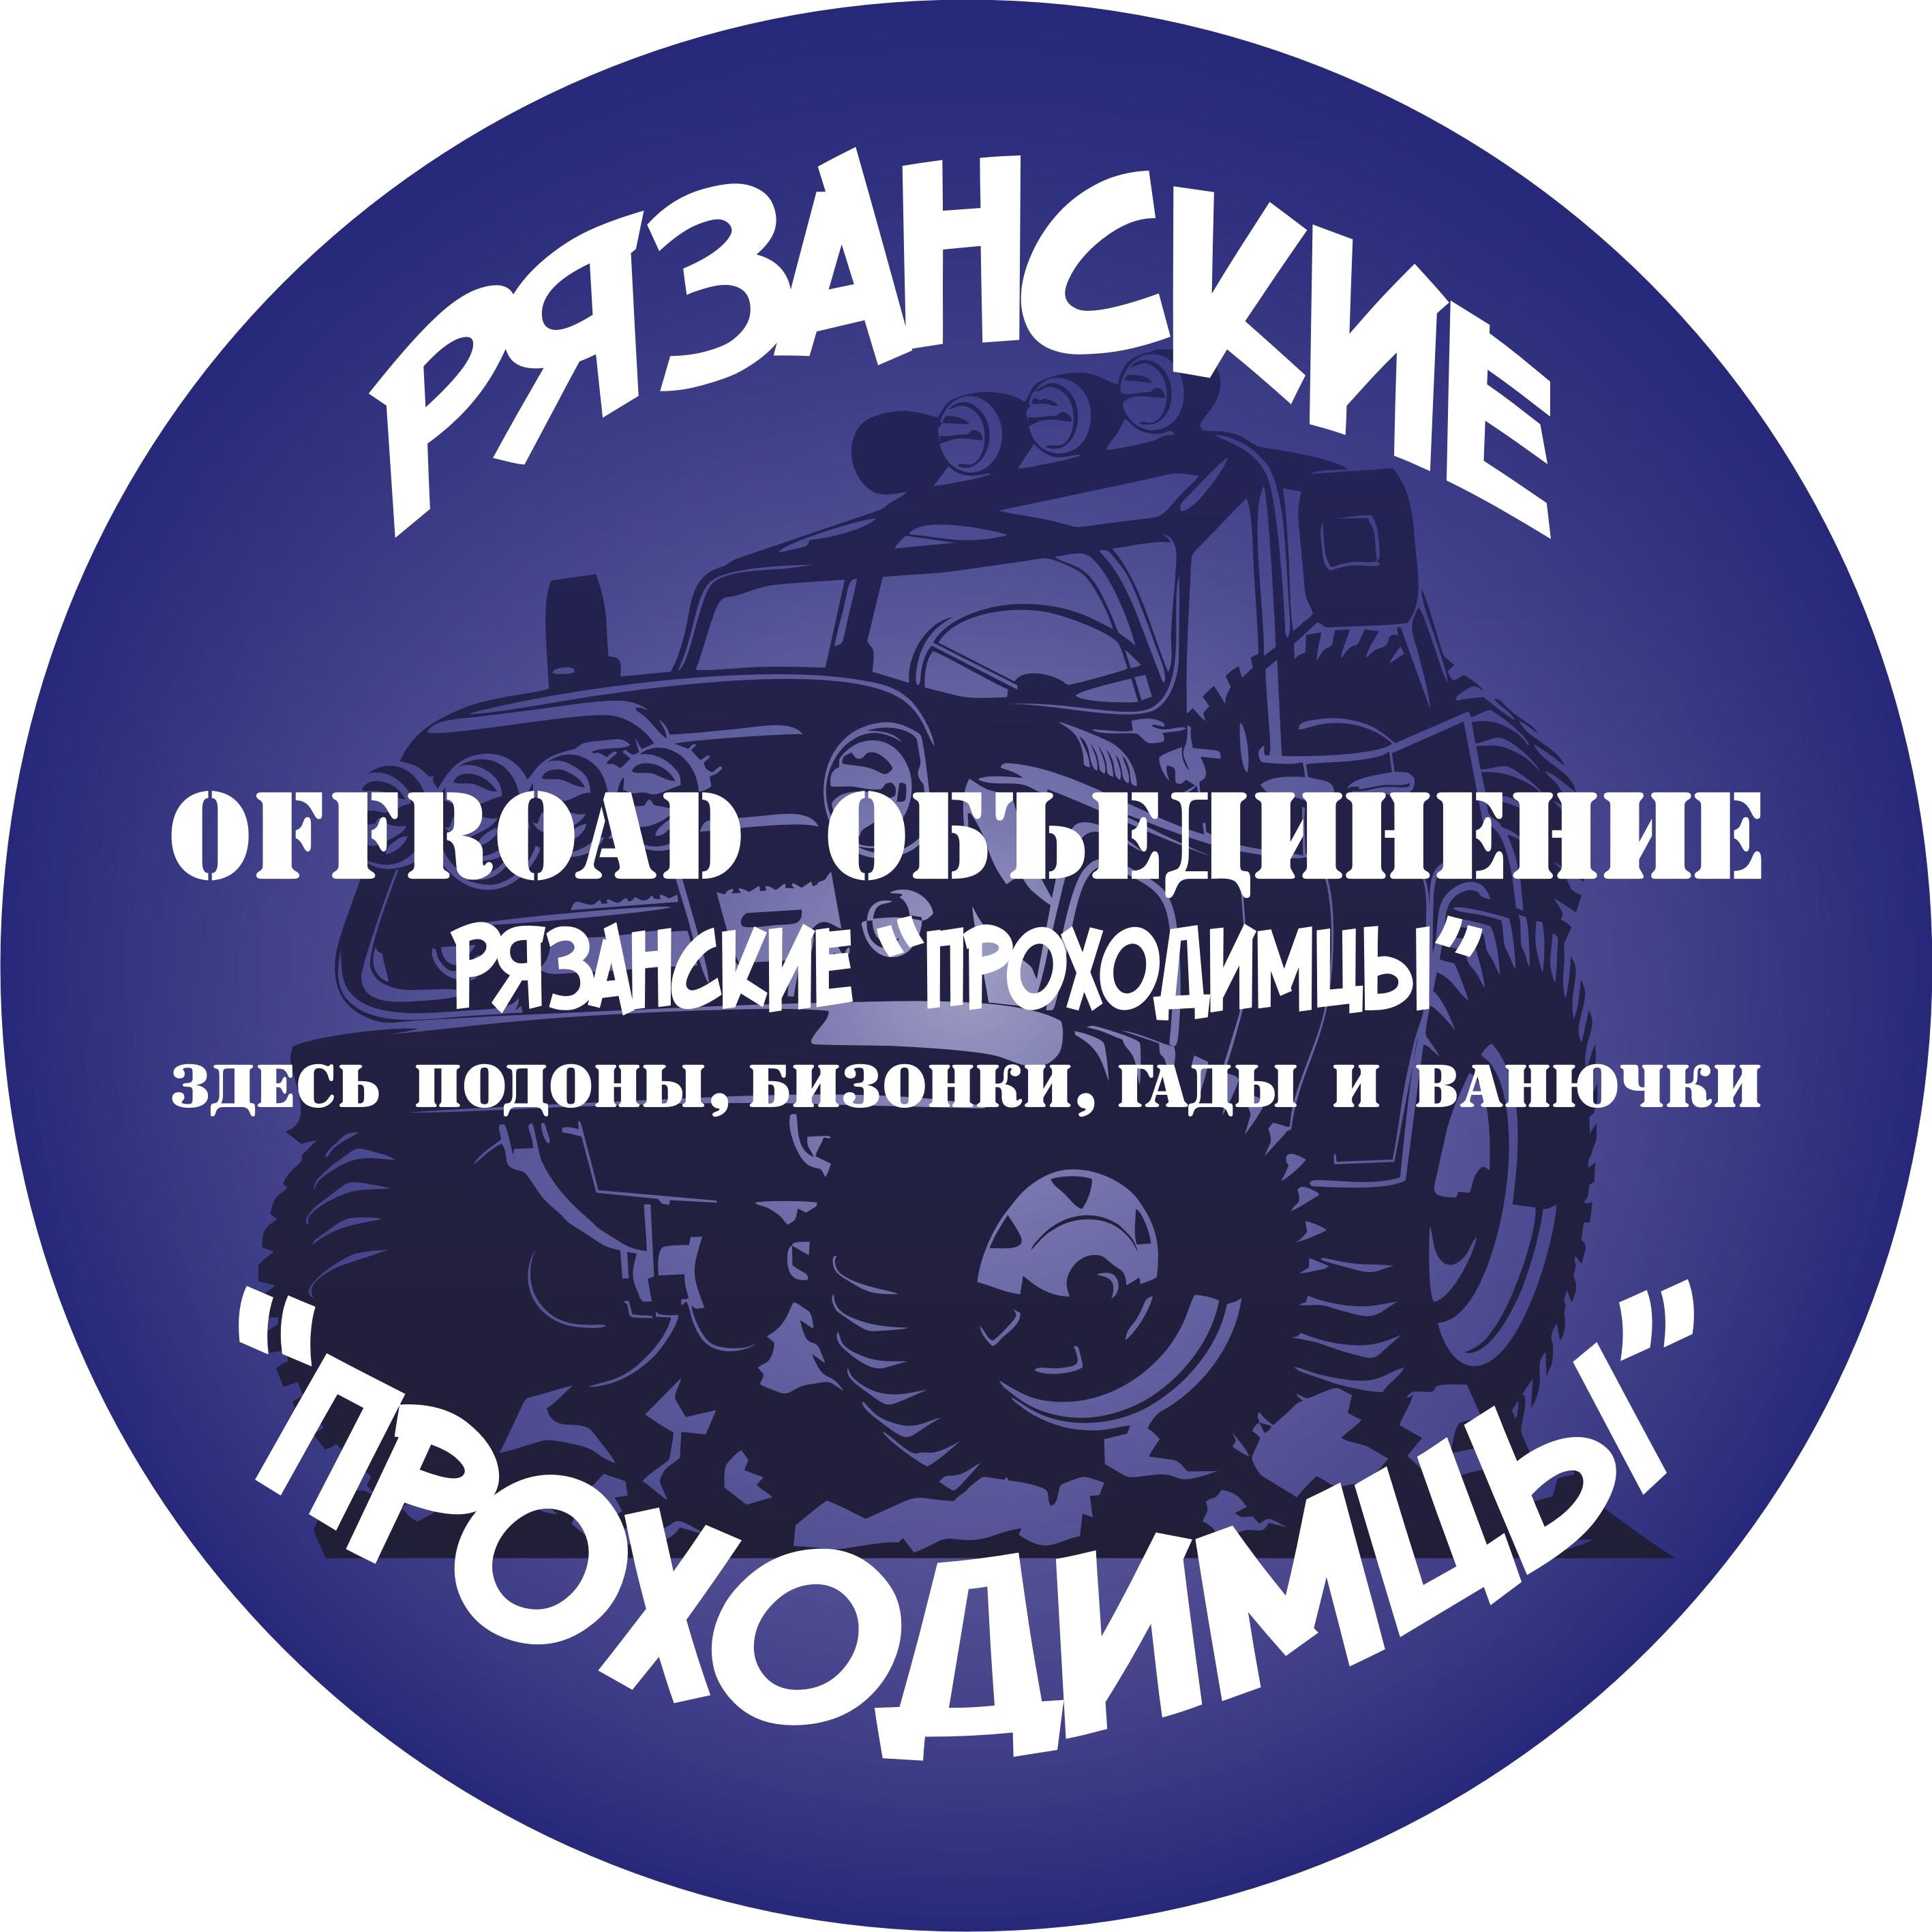 http://s0.uploads.ru/MsYO4.jpg